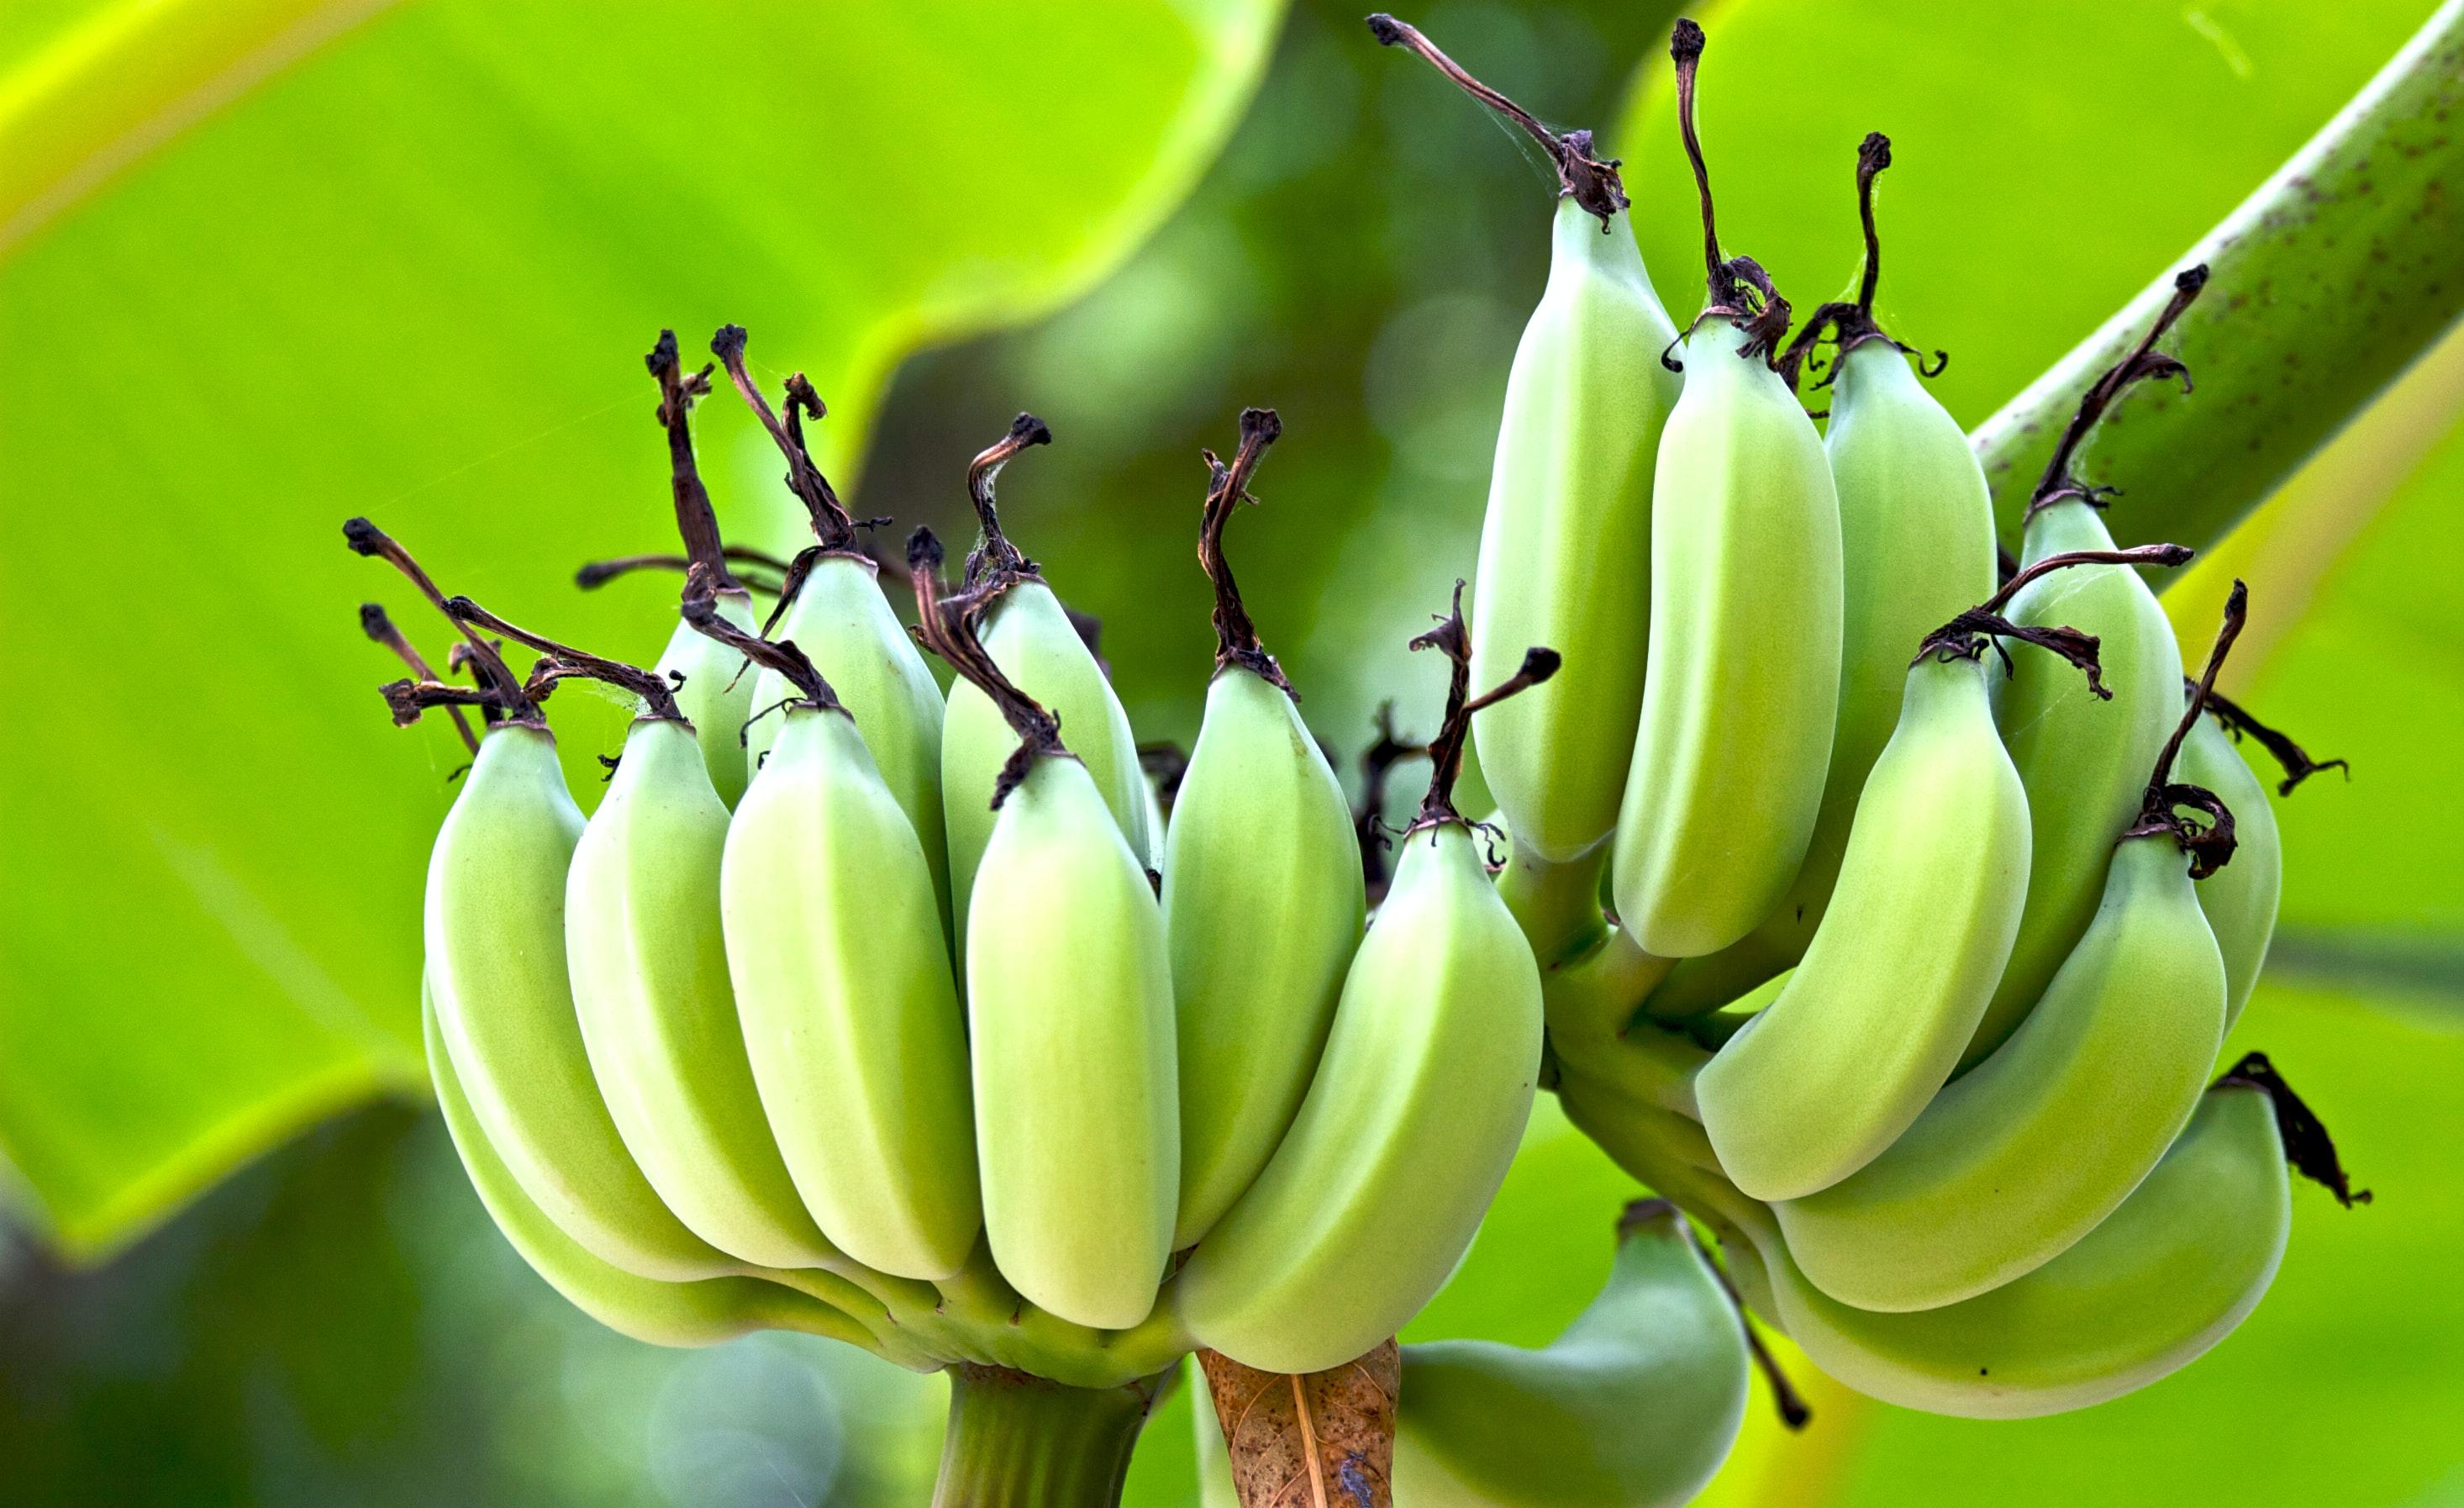 Bananitos retten